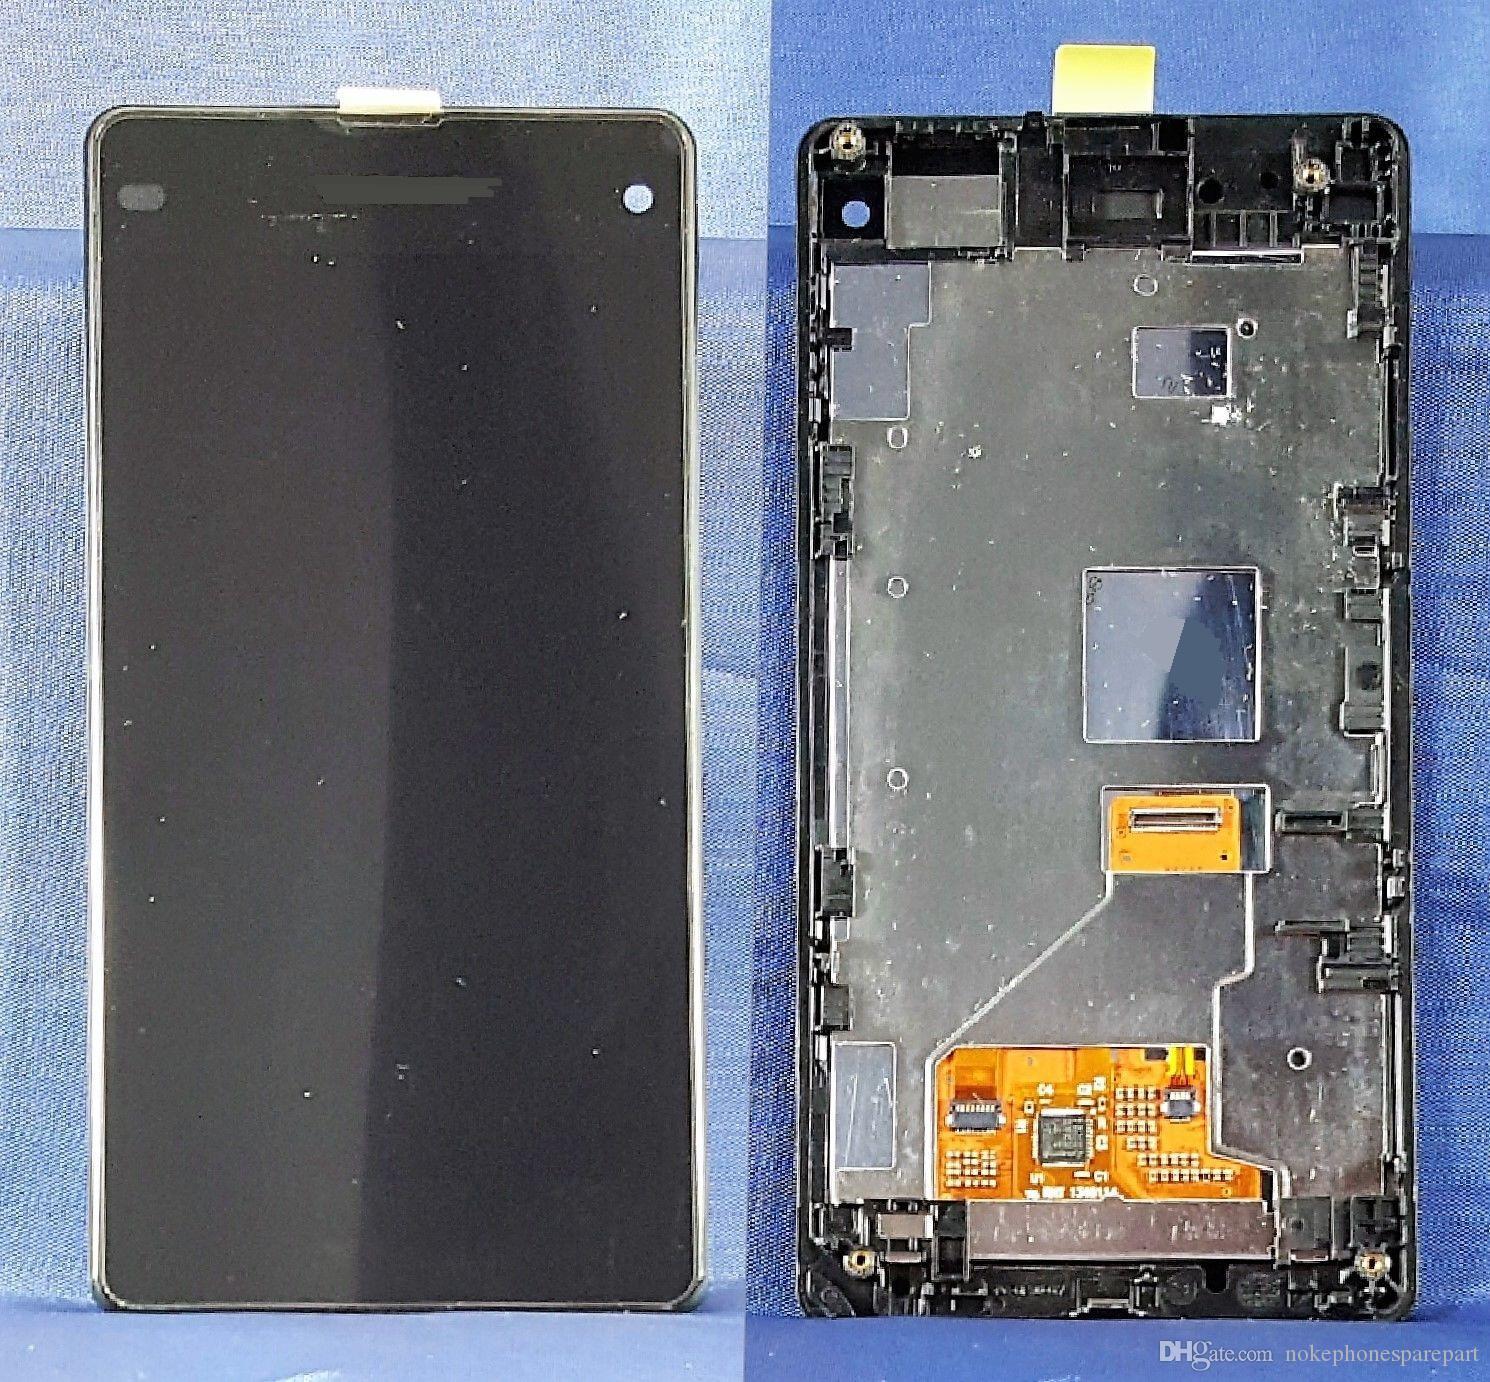 SCHERMO ДИСПЛЕЙ LCD СЕНСОРНЫЙ ЭКРАН SONY XPERIA Z1 COMPACT D5503 РАМКА NERO ЧЕРНЫЙ